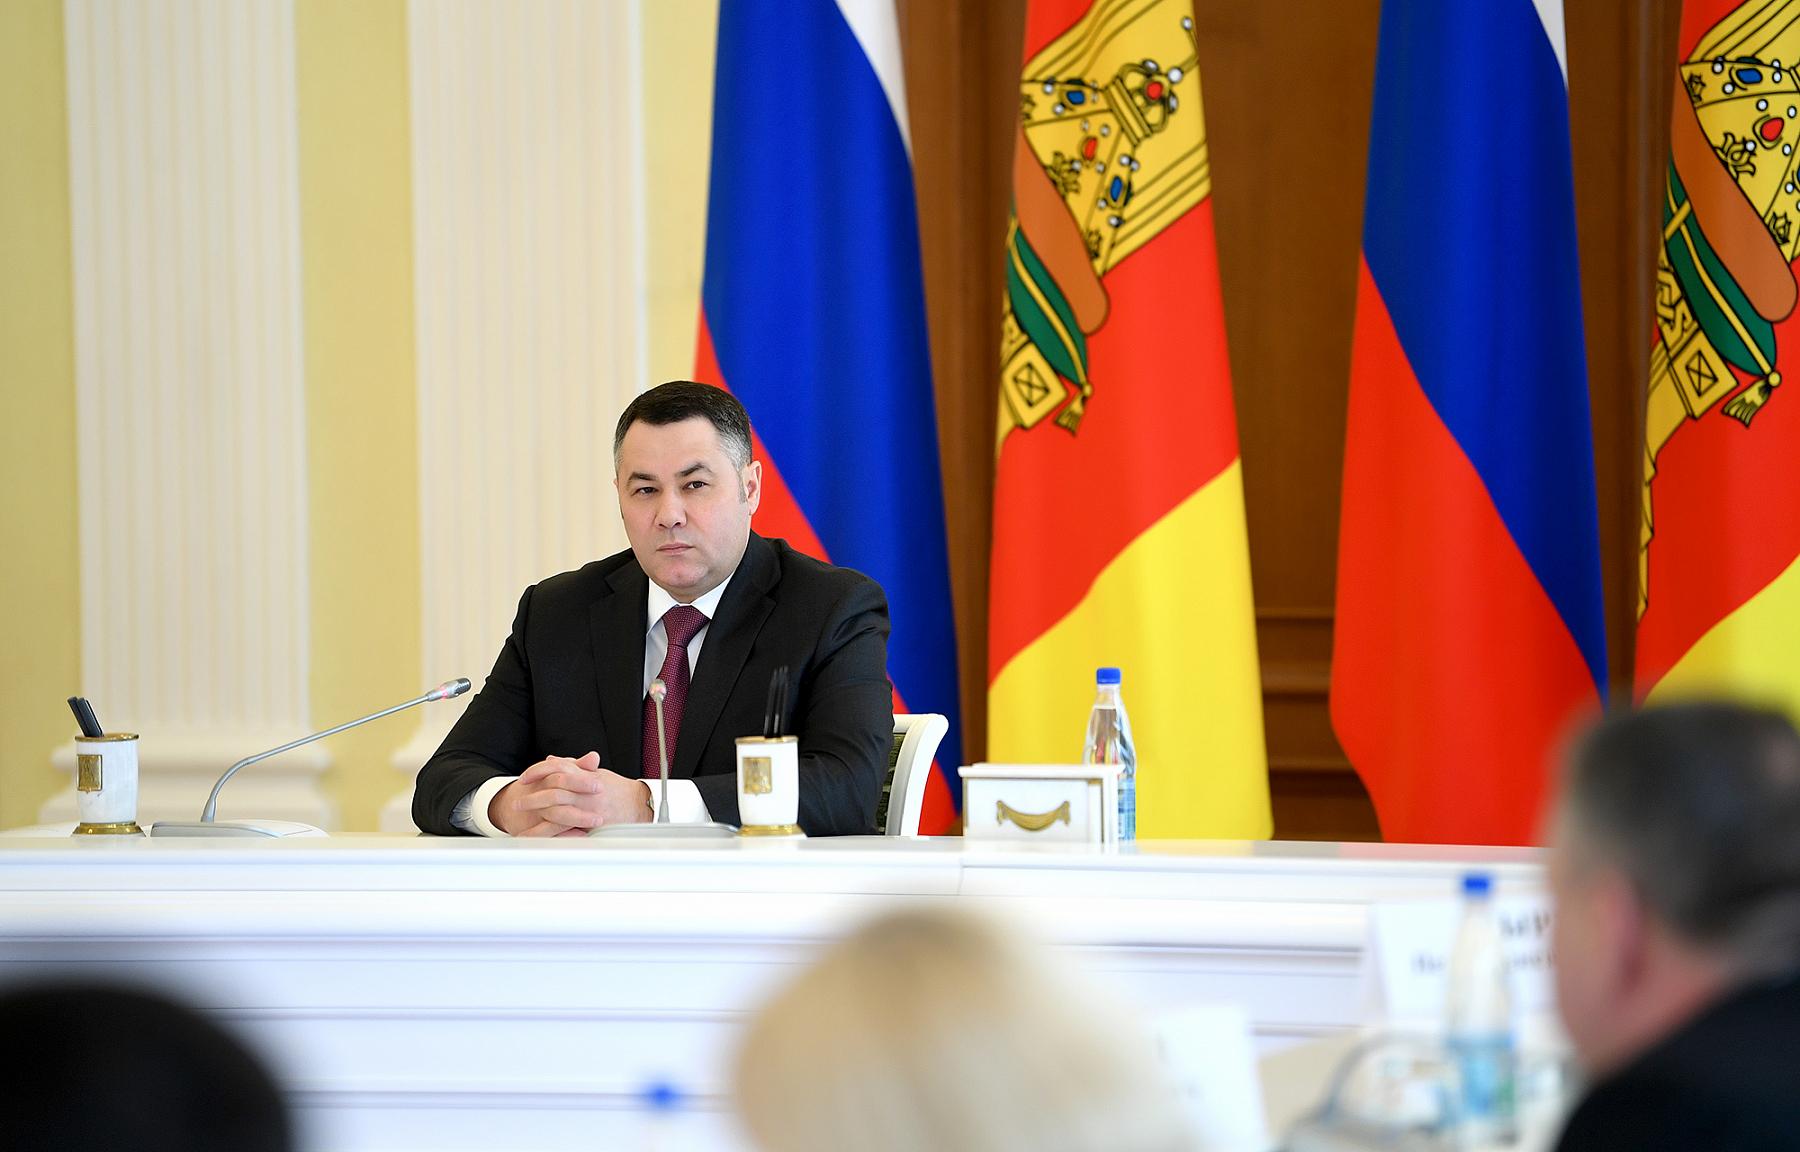 Игорь Руденя обсудил со штабом ситуацию по коронавирусу